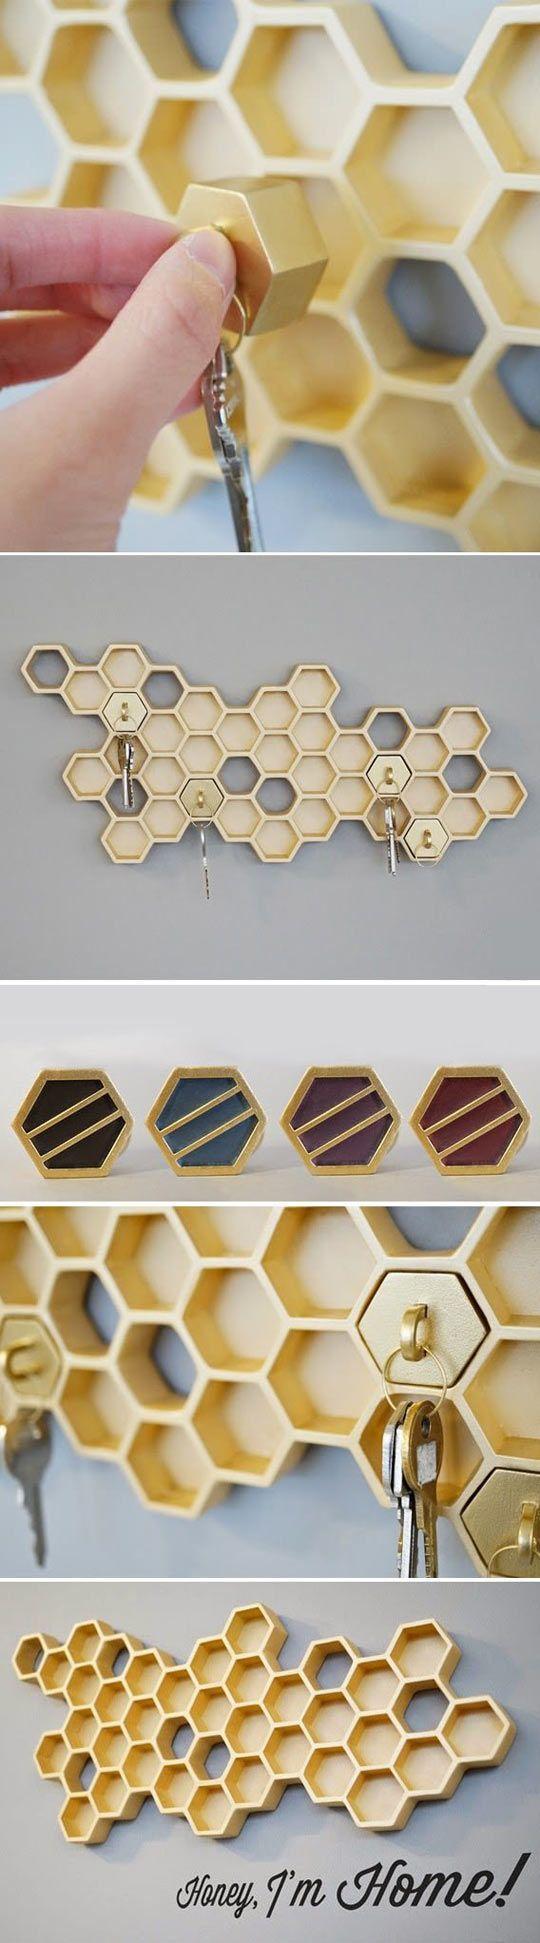 """Honey, I'm Home: Modular Keychain Organization System"" (article), on dornob. I need this in my life."